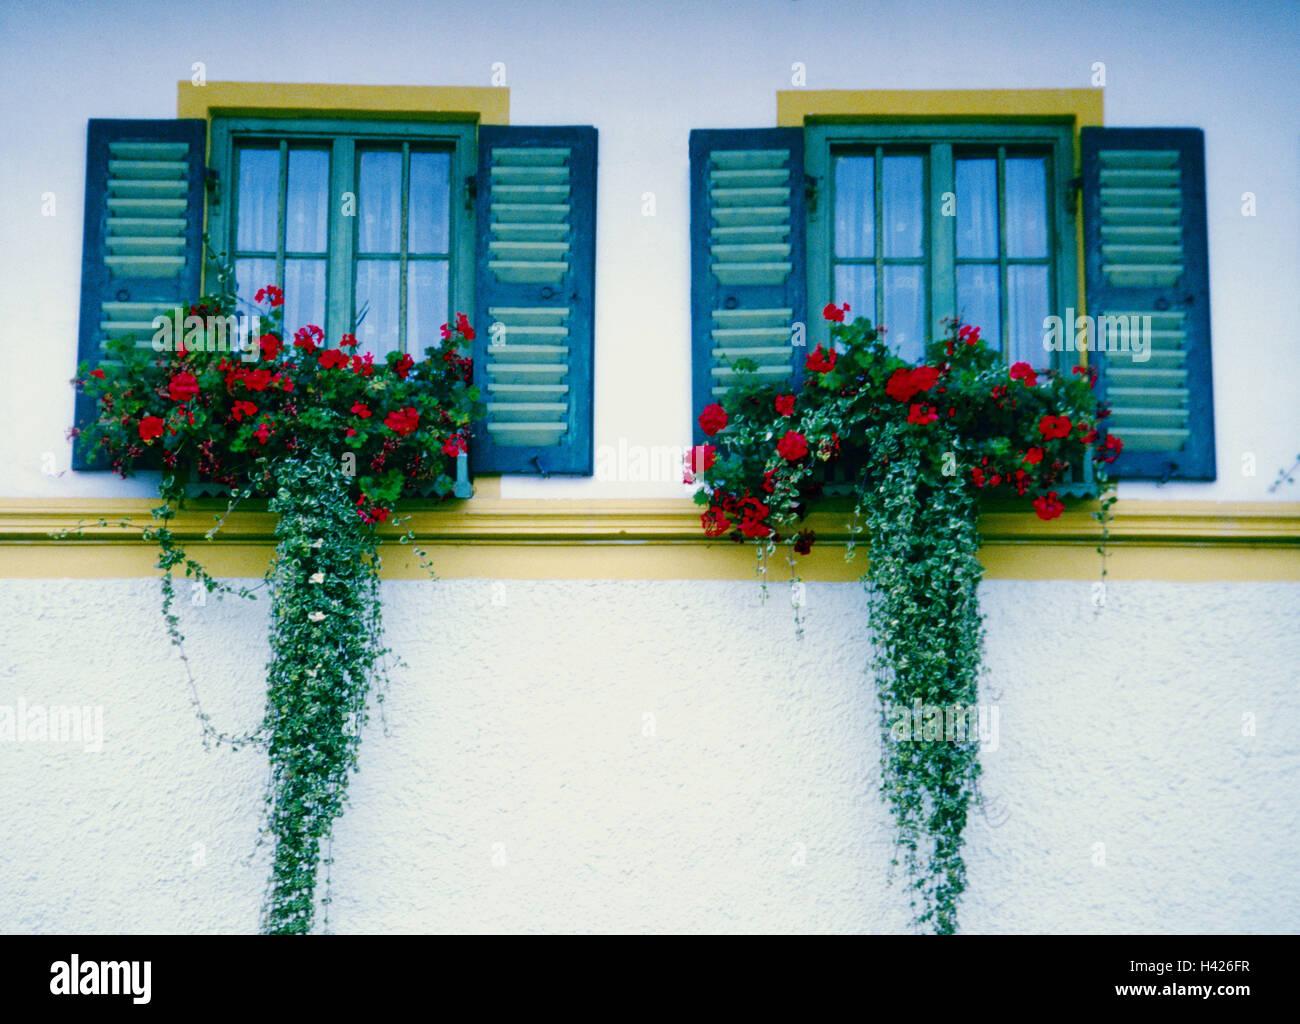 Residenz Fassade Detail Windows Blumenschmuck Gebaude Haus